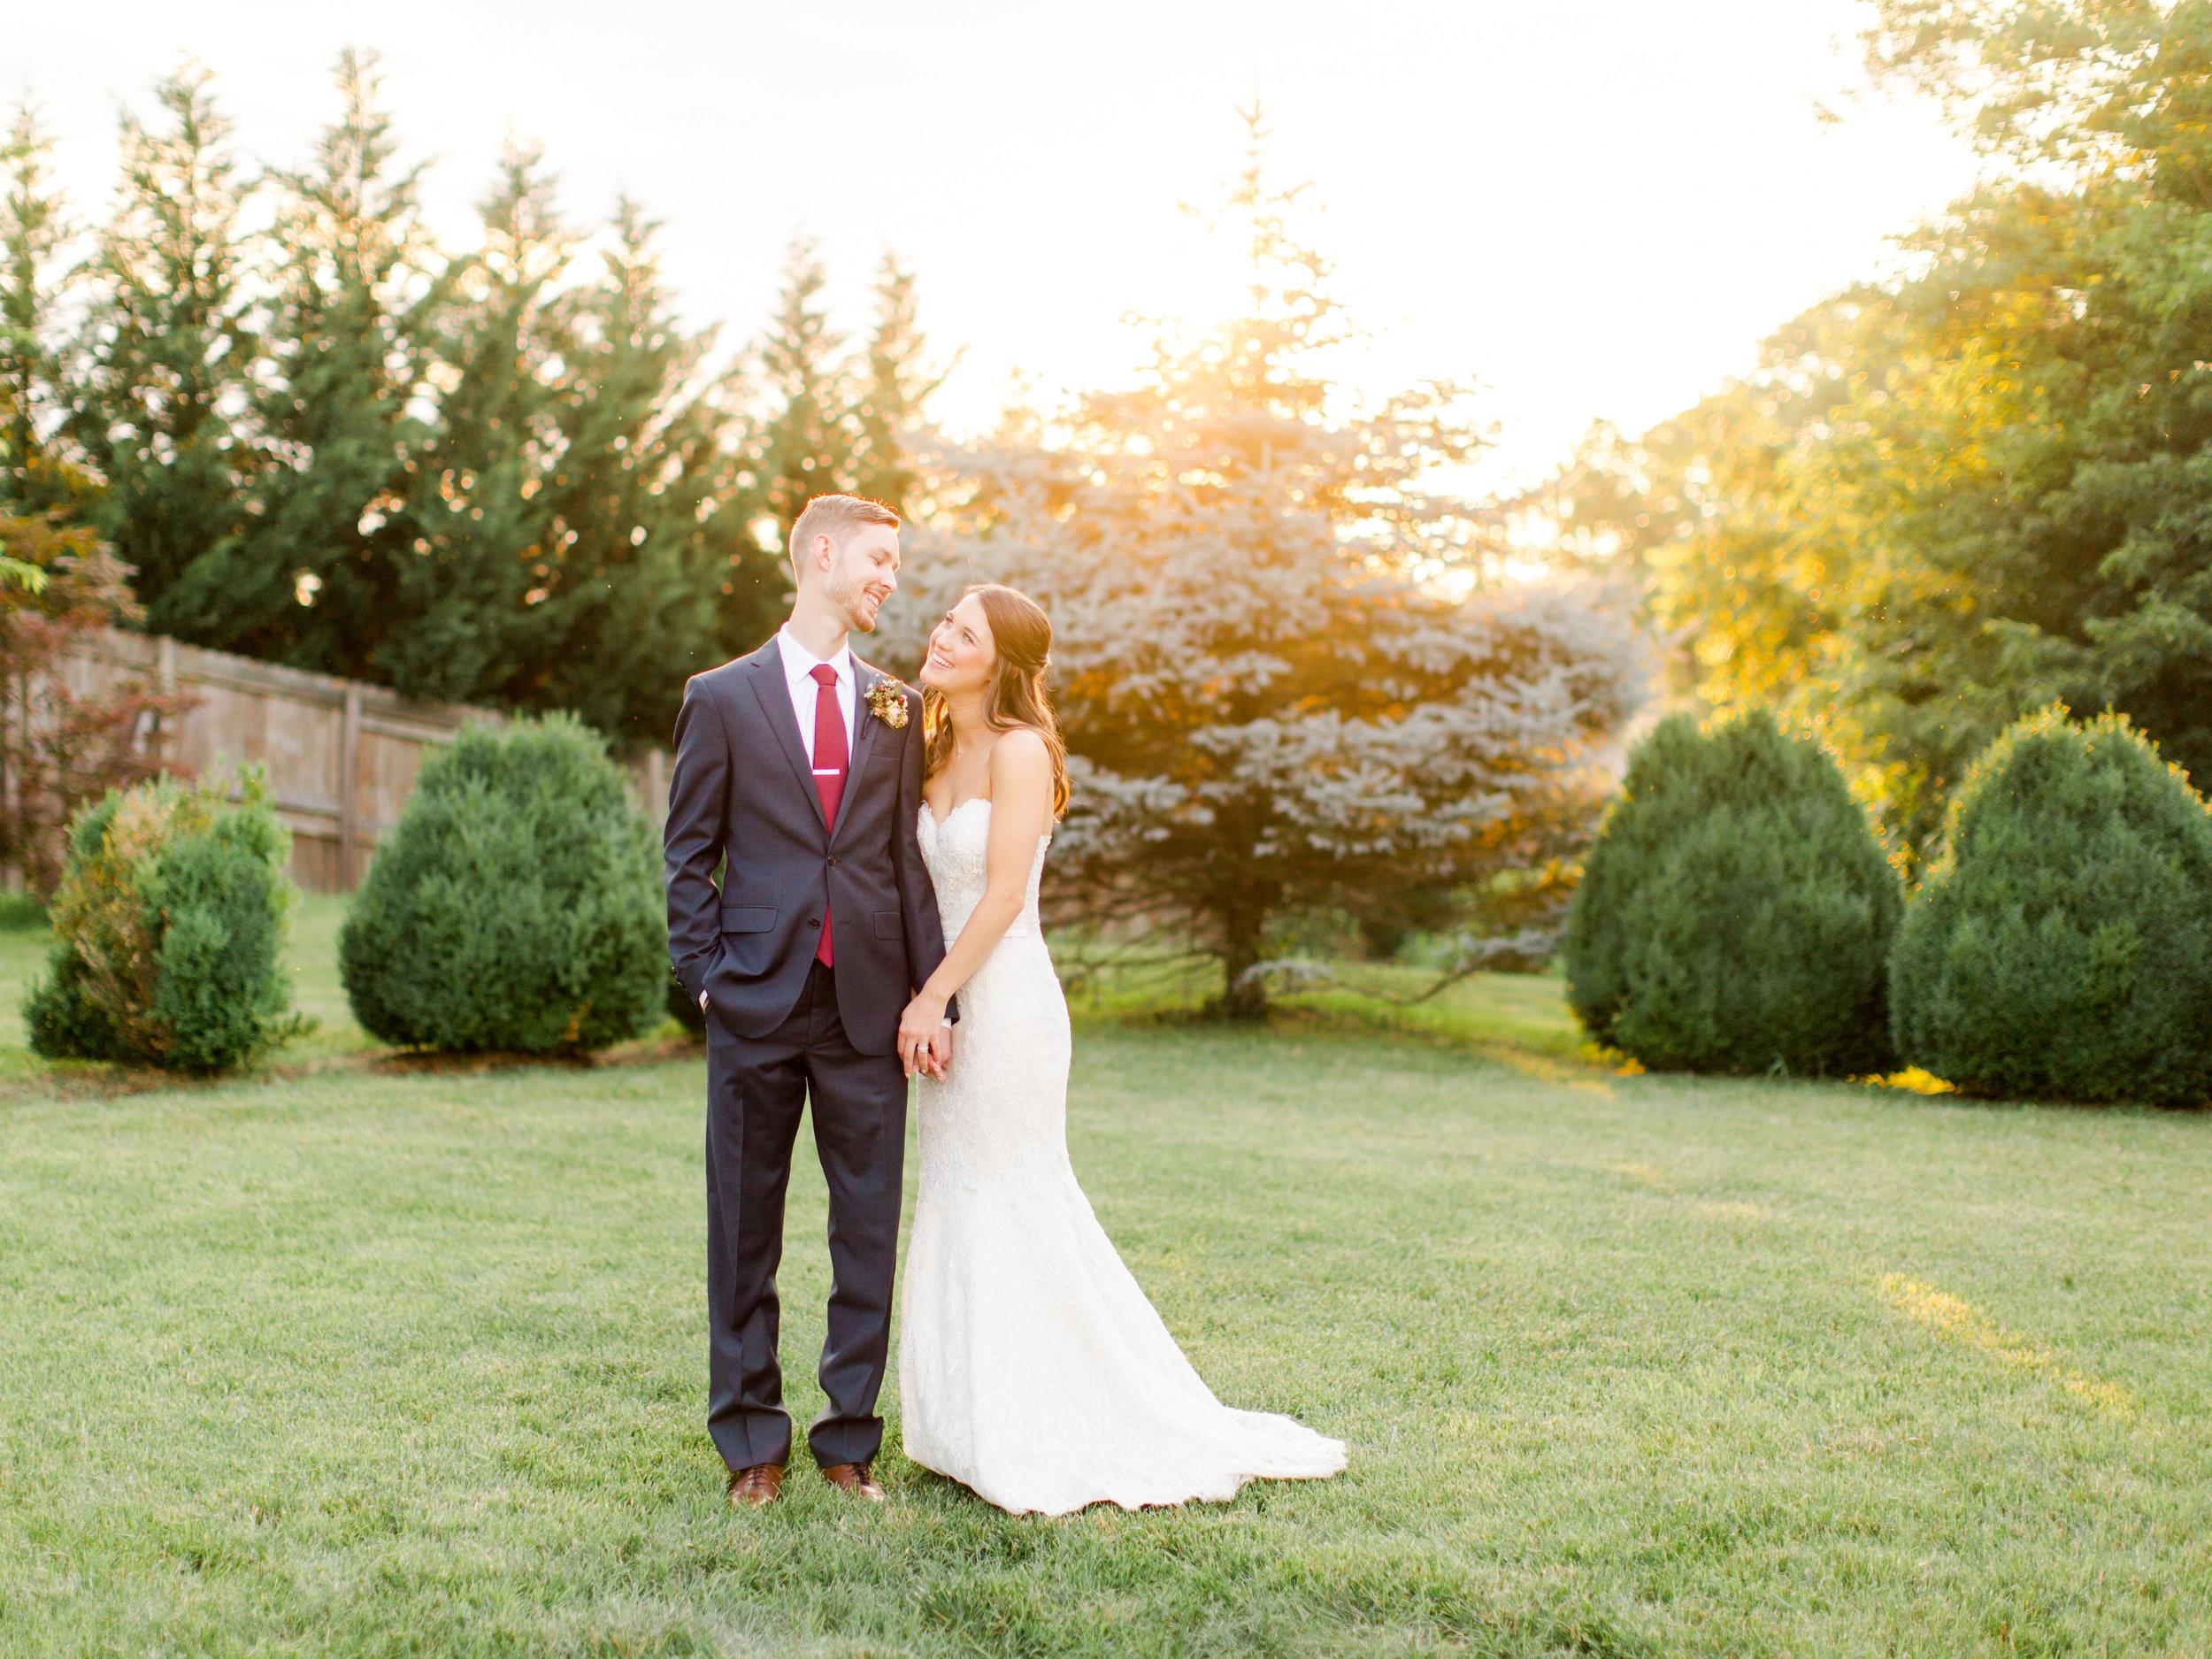 roanoke-virginia-wedding-photographer-plantation-on-sunnybrook-meredith-and-logan-1217.jpg